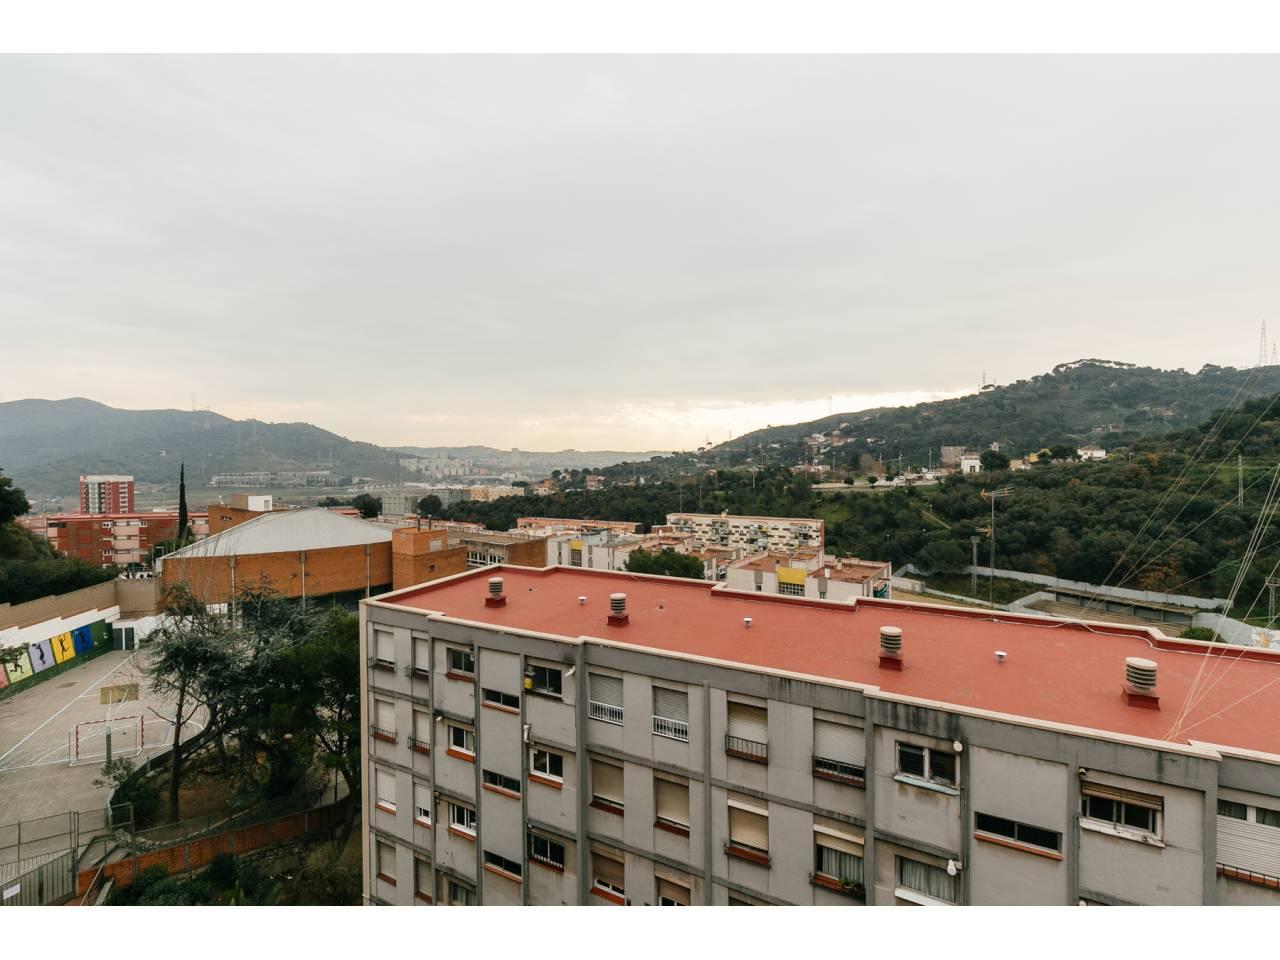 Pisos en barcelona zona nou barris - Pisos en nou barris ...